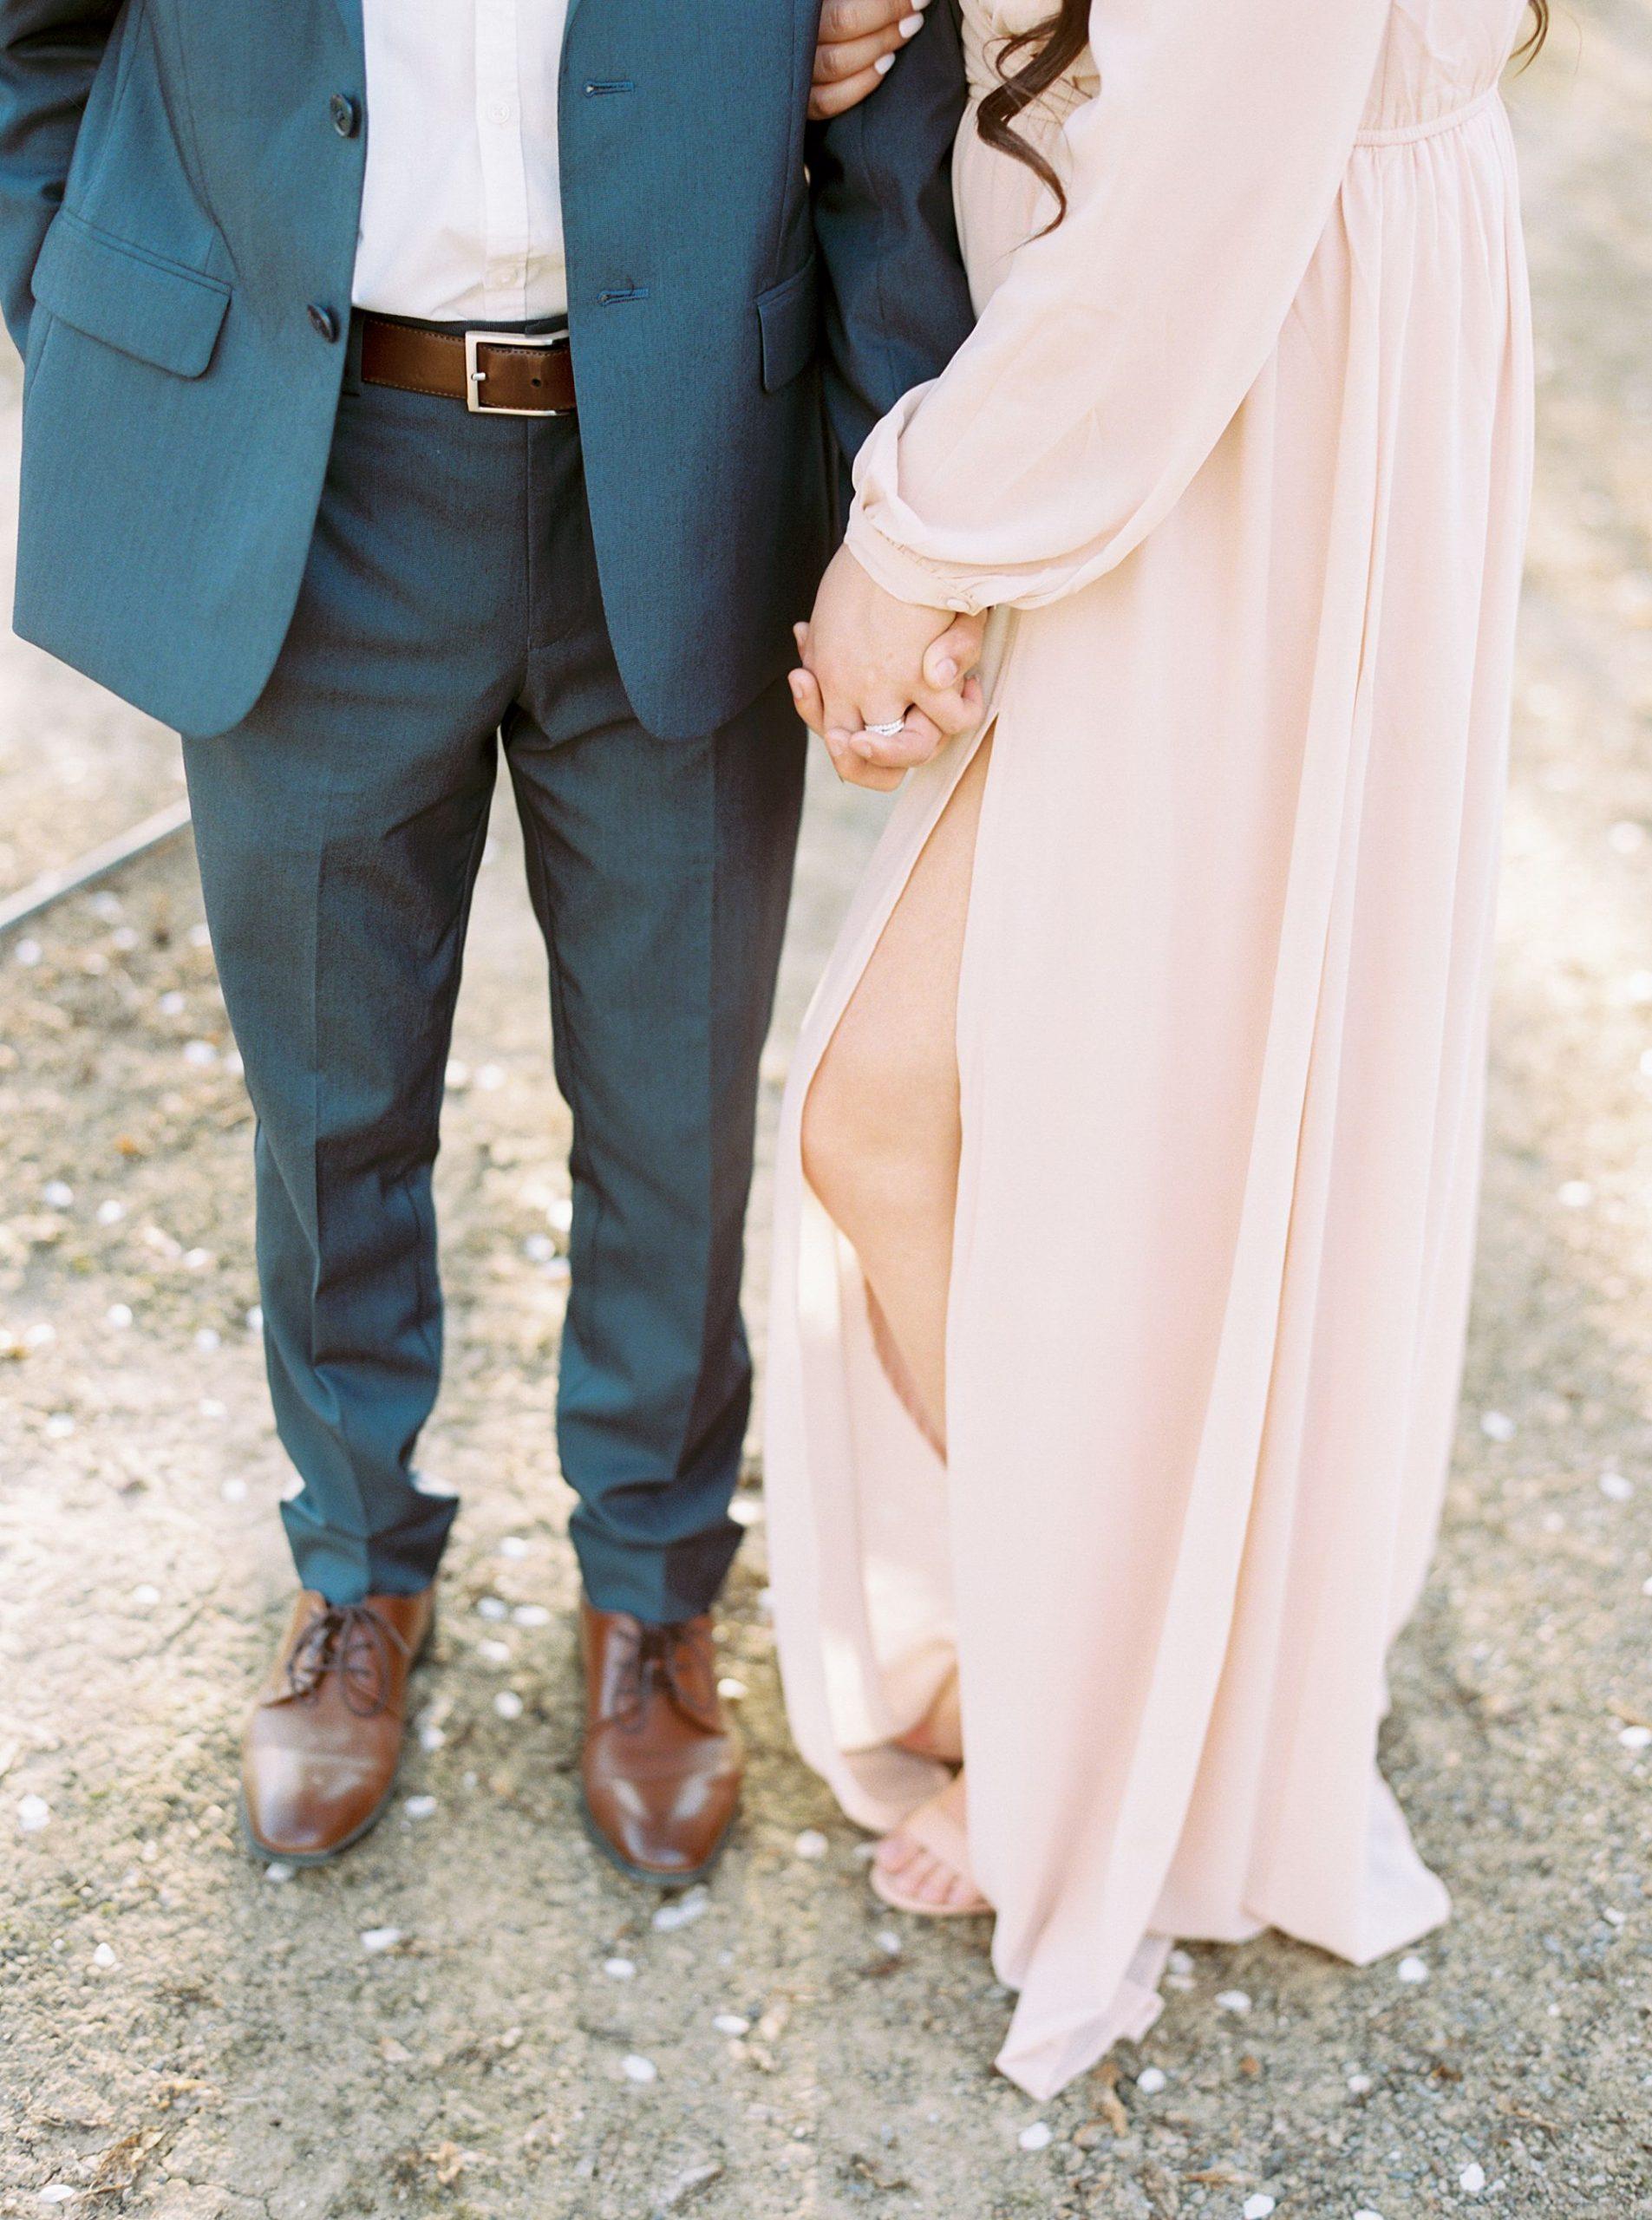 Almond Orchard Engagement Session - Caley and Tyler - Lone Oak Wedding - Ashley Baumgartner - Almond Blossom_0014.jpg